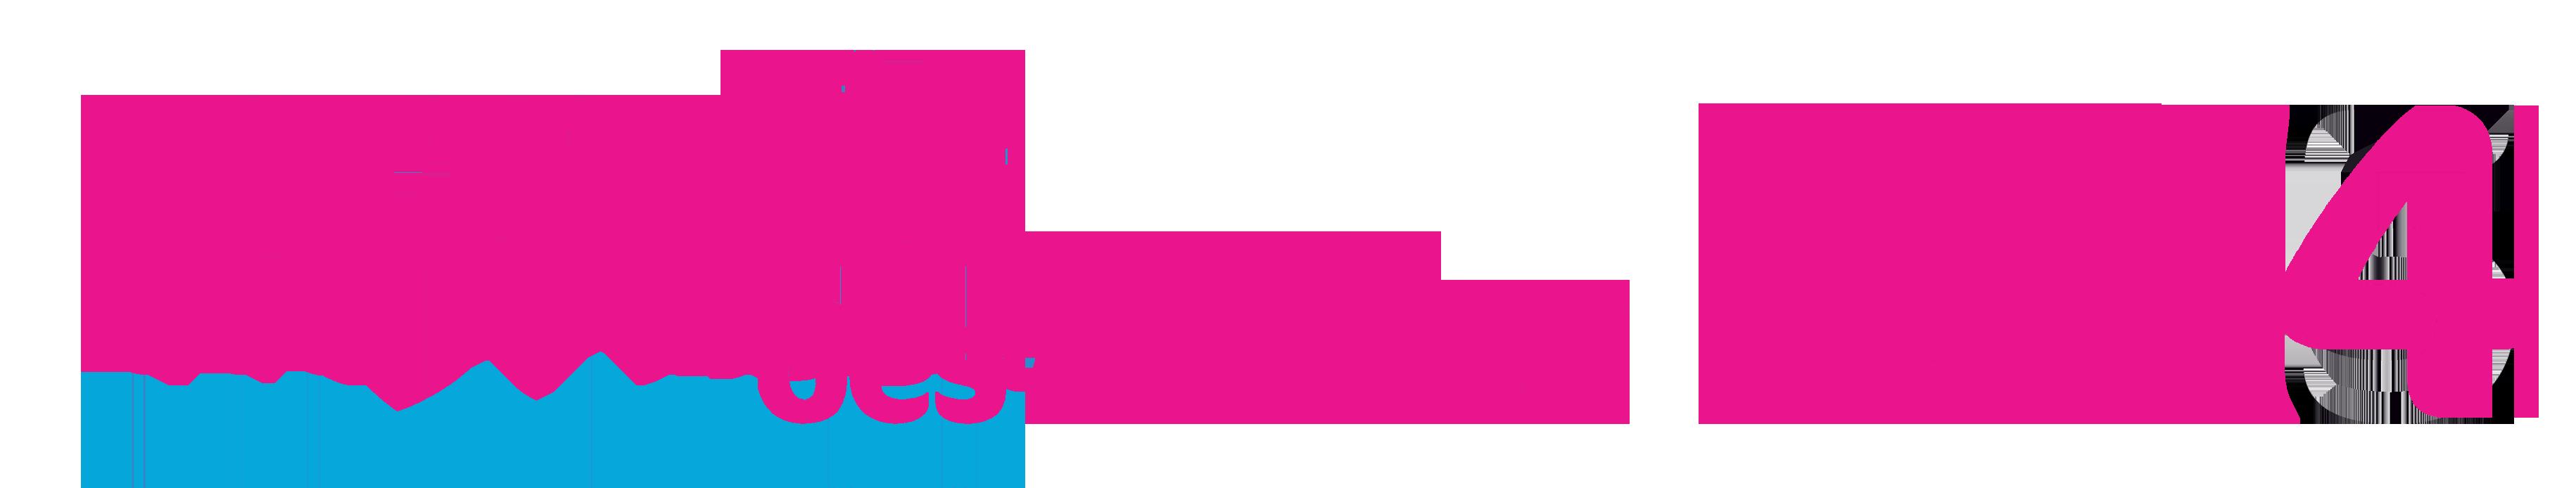 TROPHEE DES VILLES PETANQUE 2014 QUARTERBACK